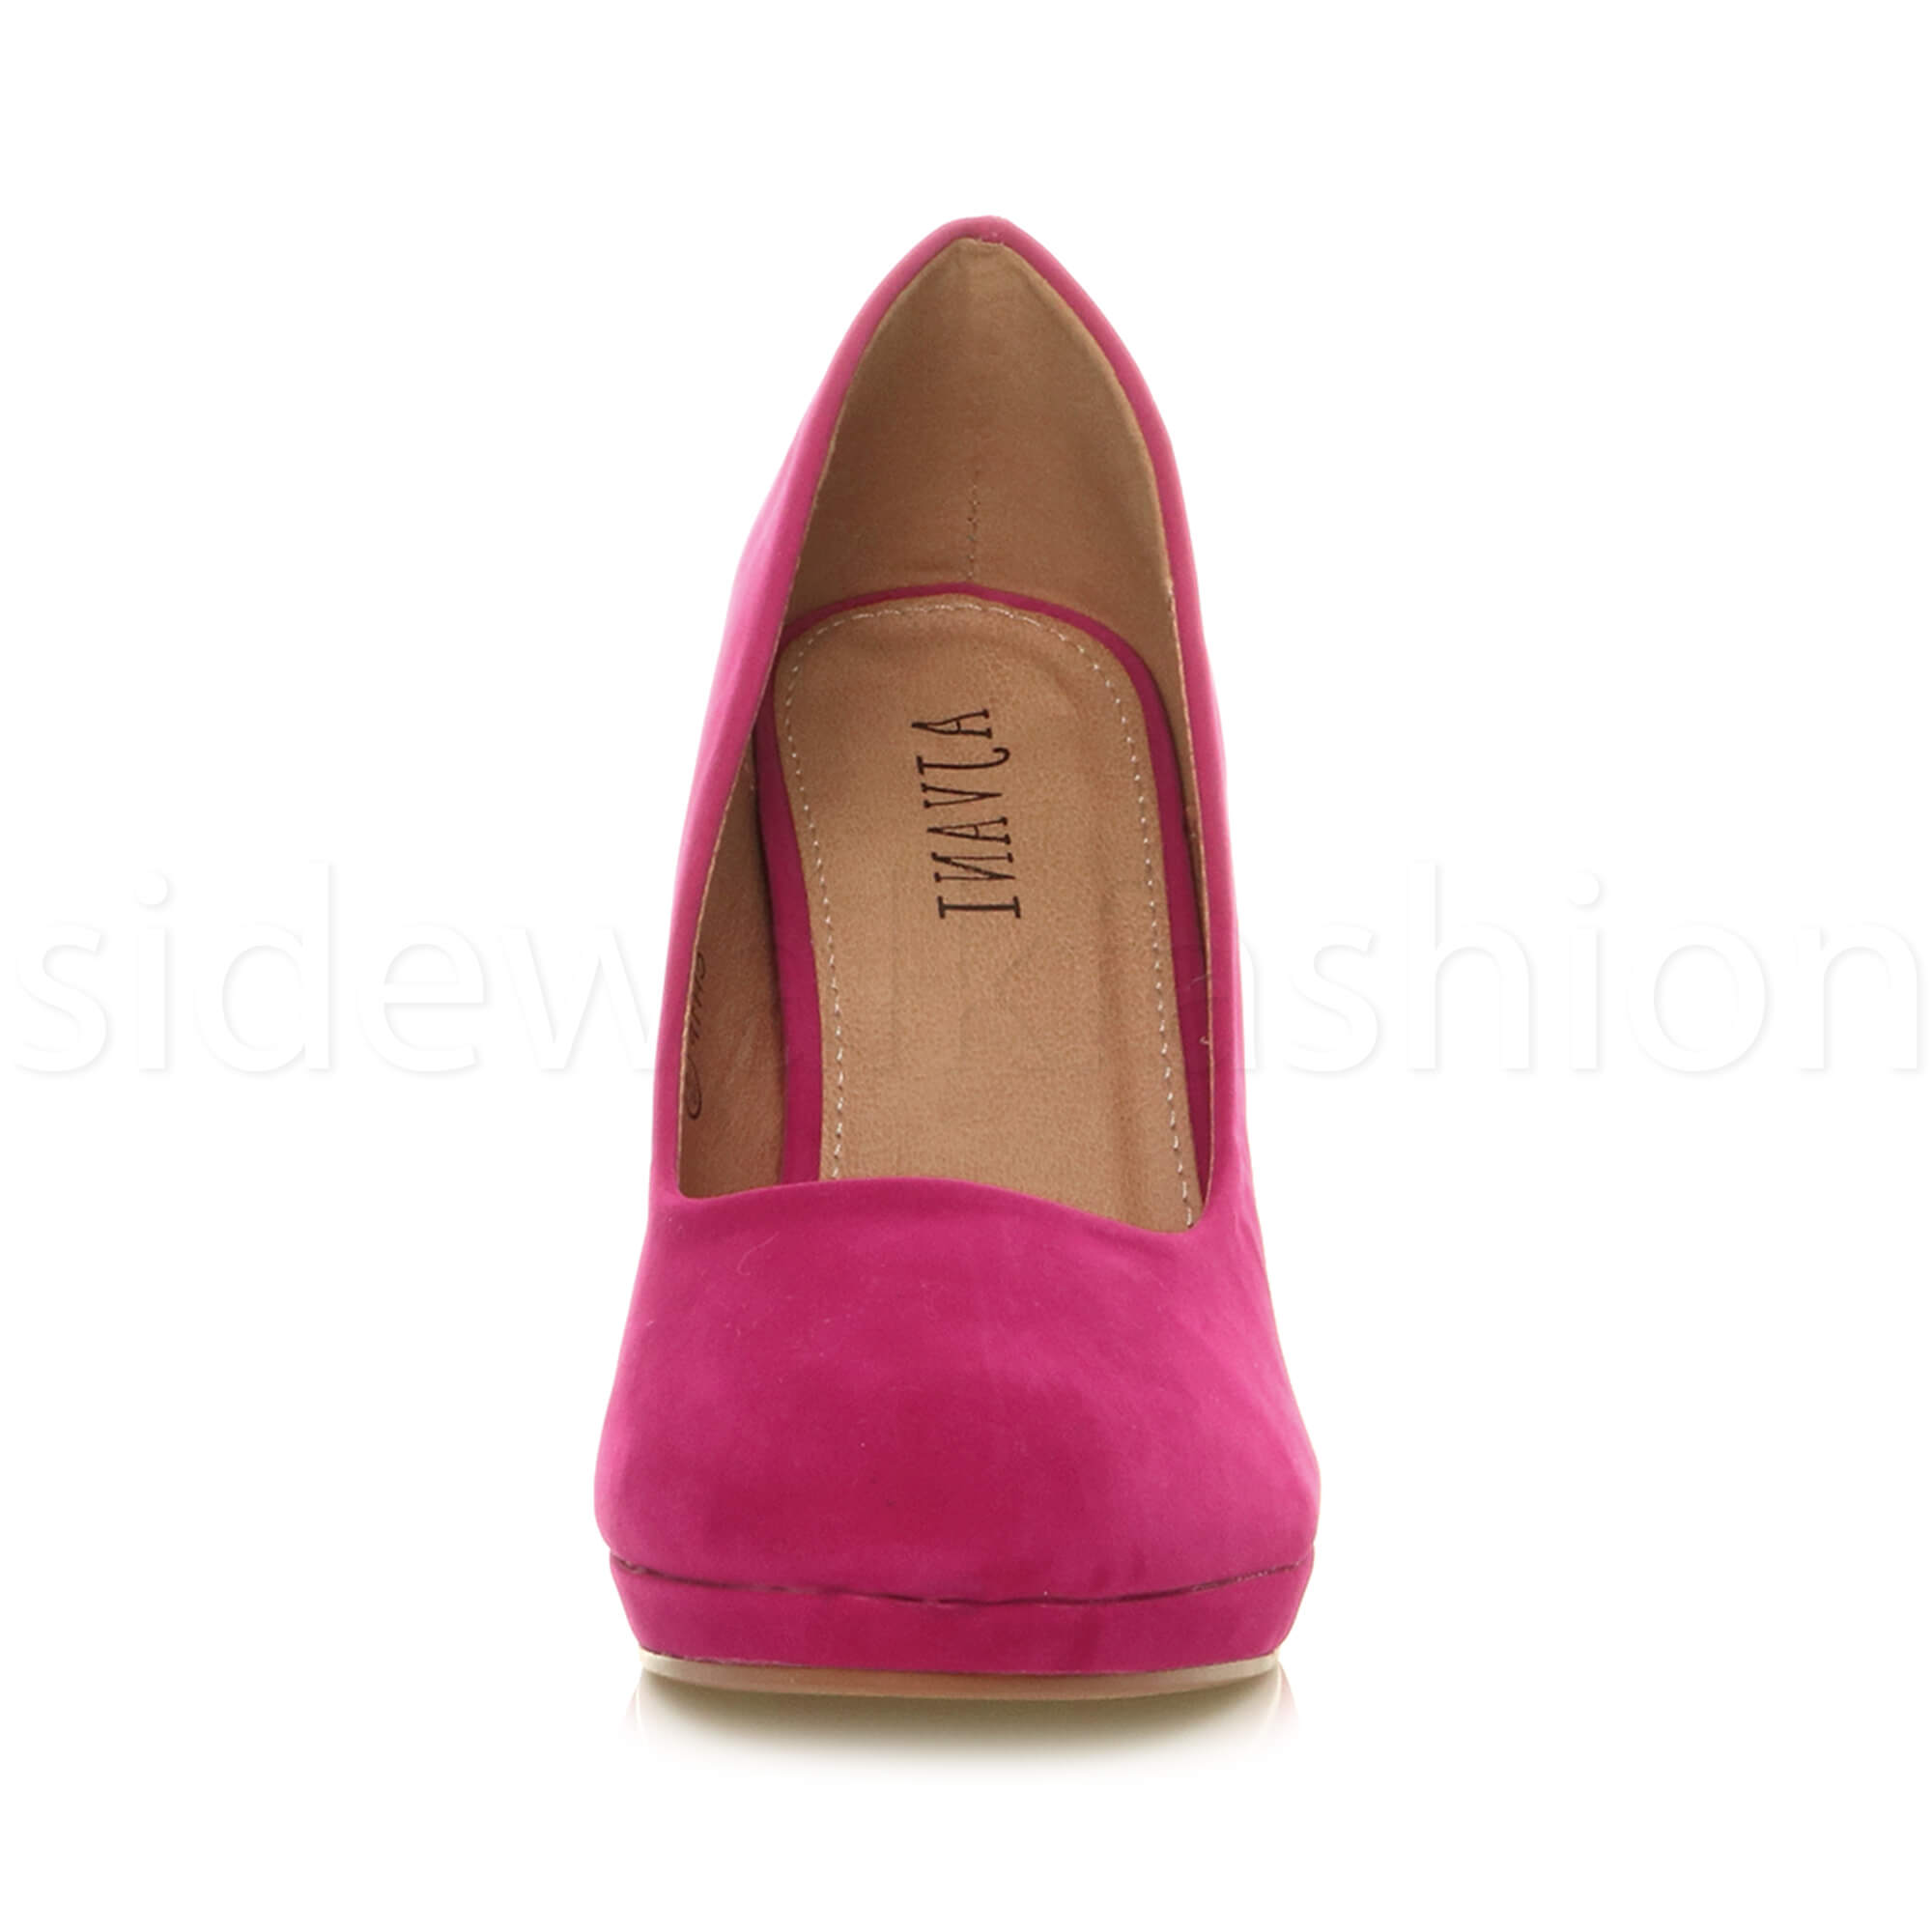 Womens-ladies-high-mid-heel-platform-wedding-evening-bridesmaid-court-shoes-size thumbnail 55